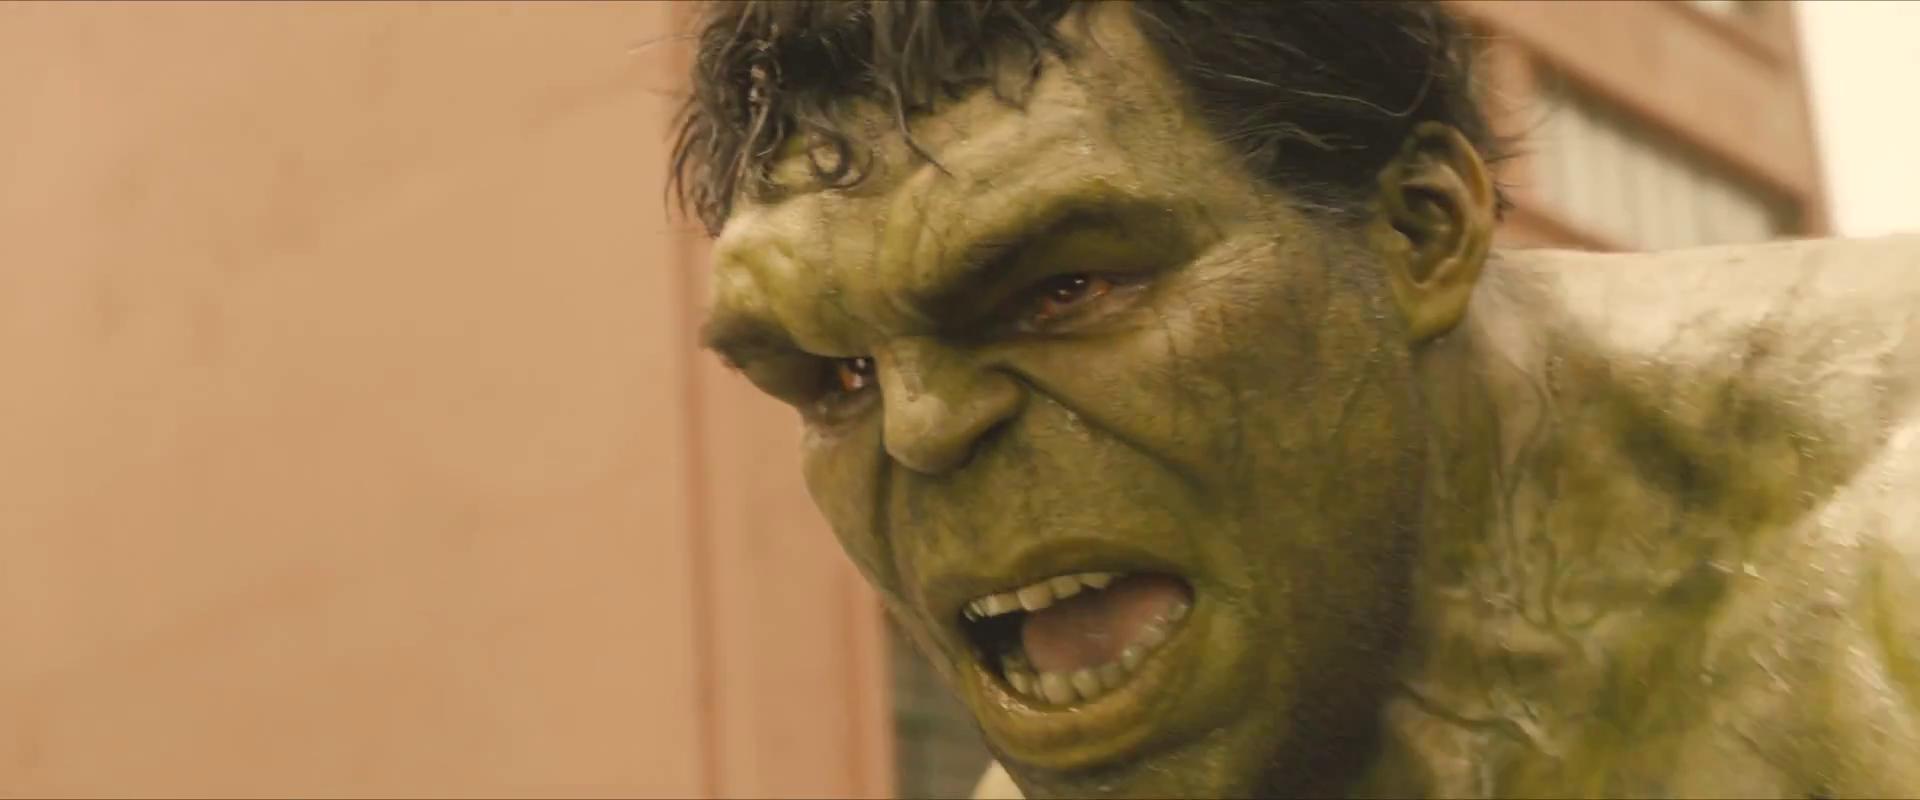 avengers-age-of-ultron-trailer-screengrab-17-hulk.png